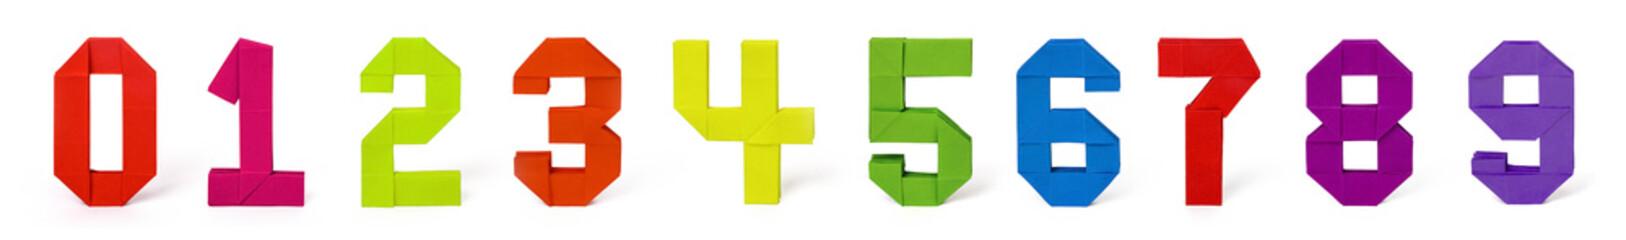 Origami paper number set